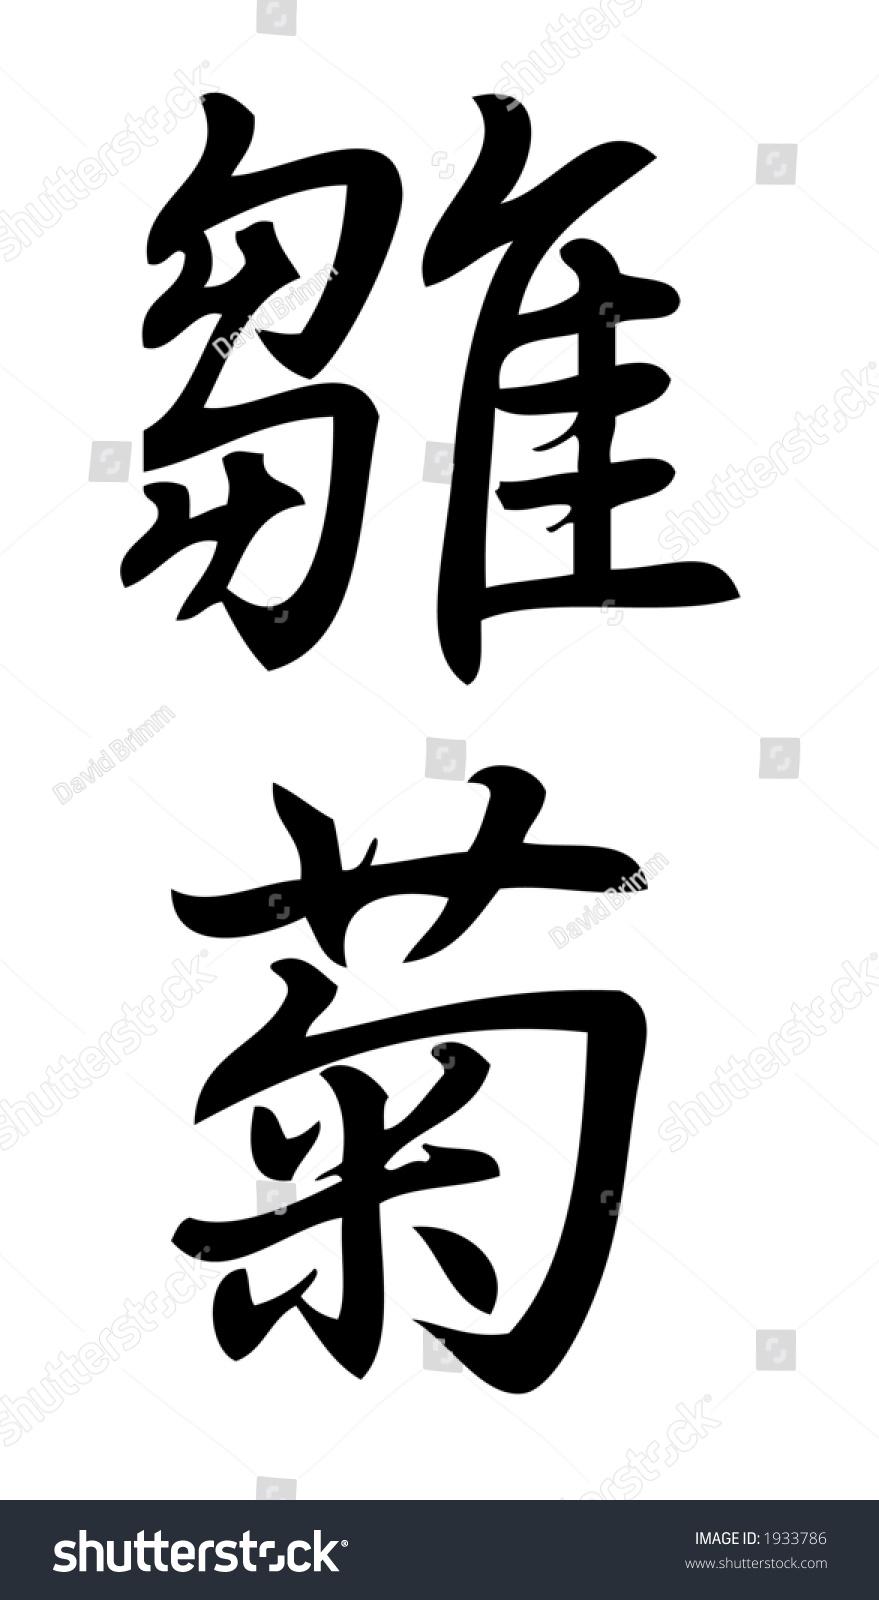 Kanji character daisy kanji one three stock illustration 1933786 kanji character for daisy kanji one of three scripts used in the japanese language biocorpaavc